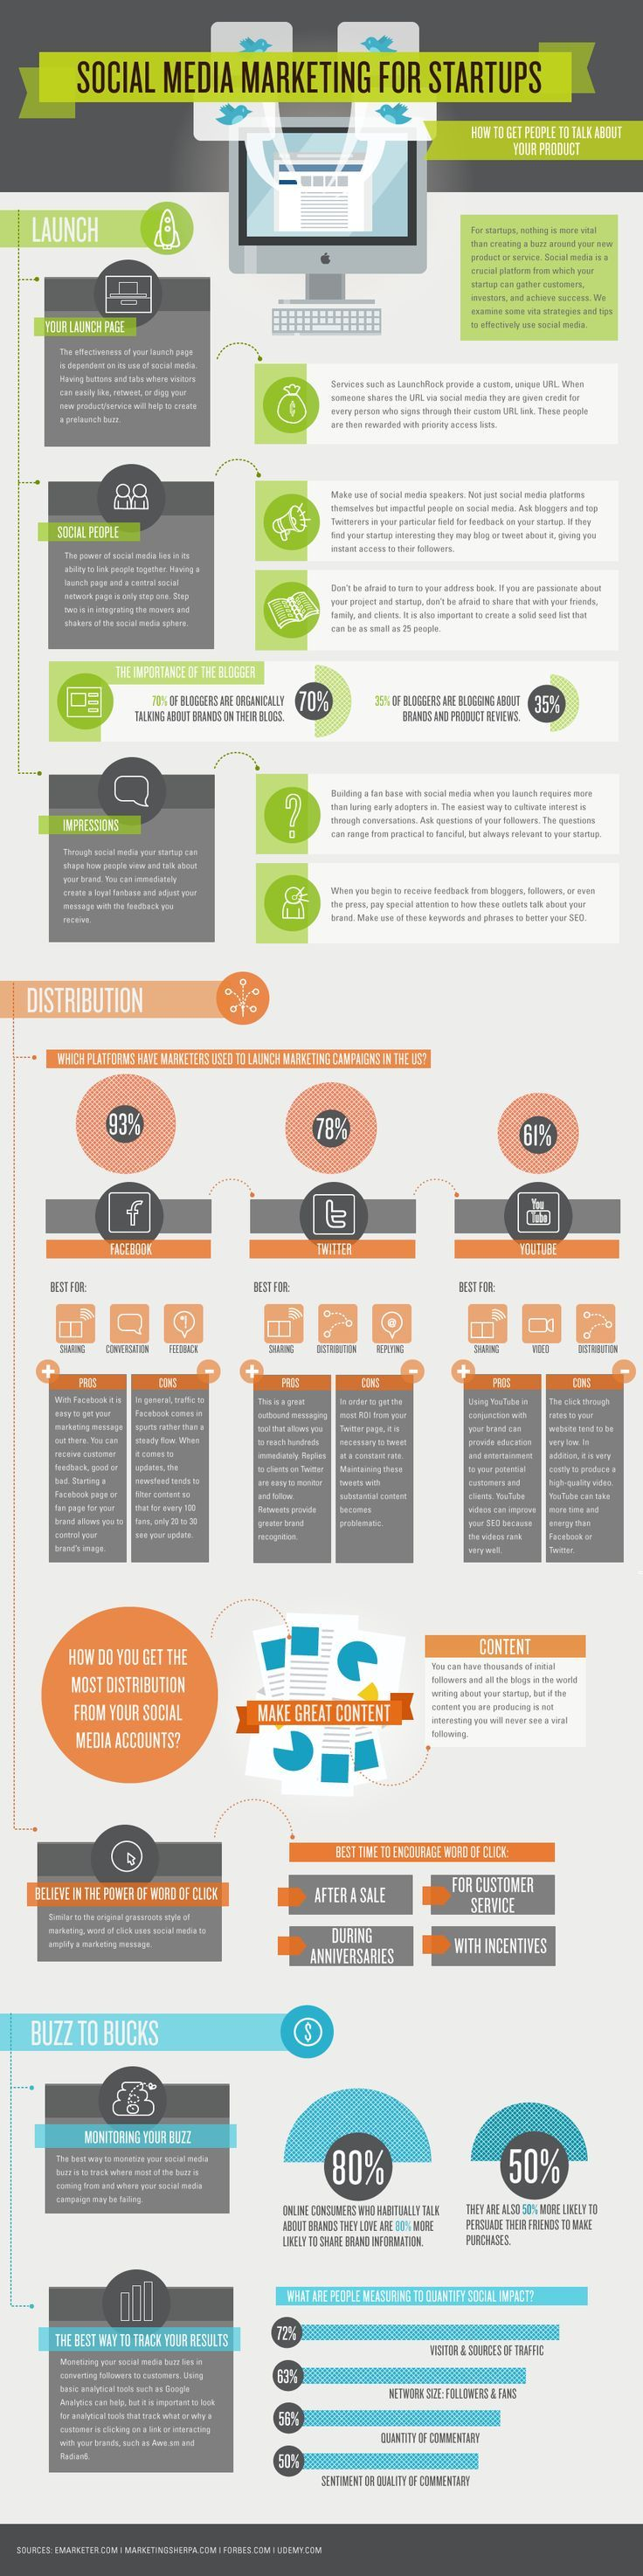 #SocialMedia #Marketing for #Startups | #SMM #Infographic